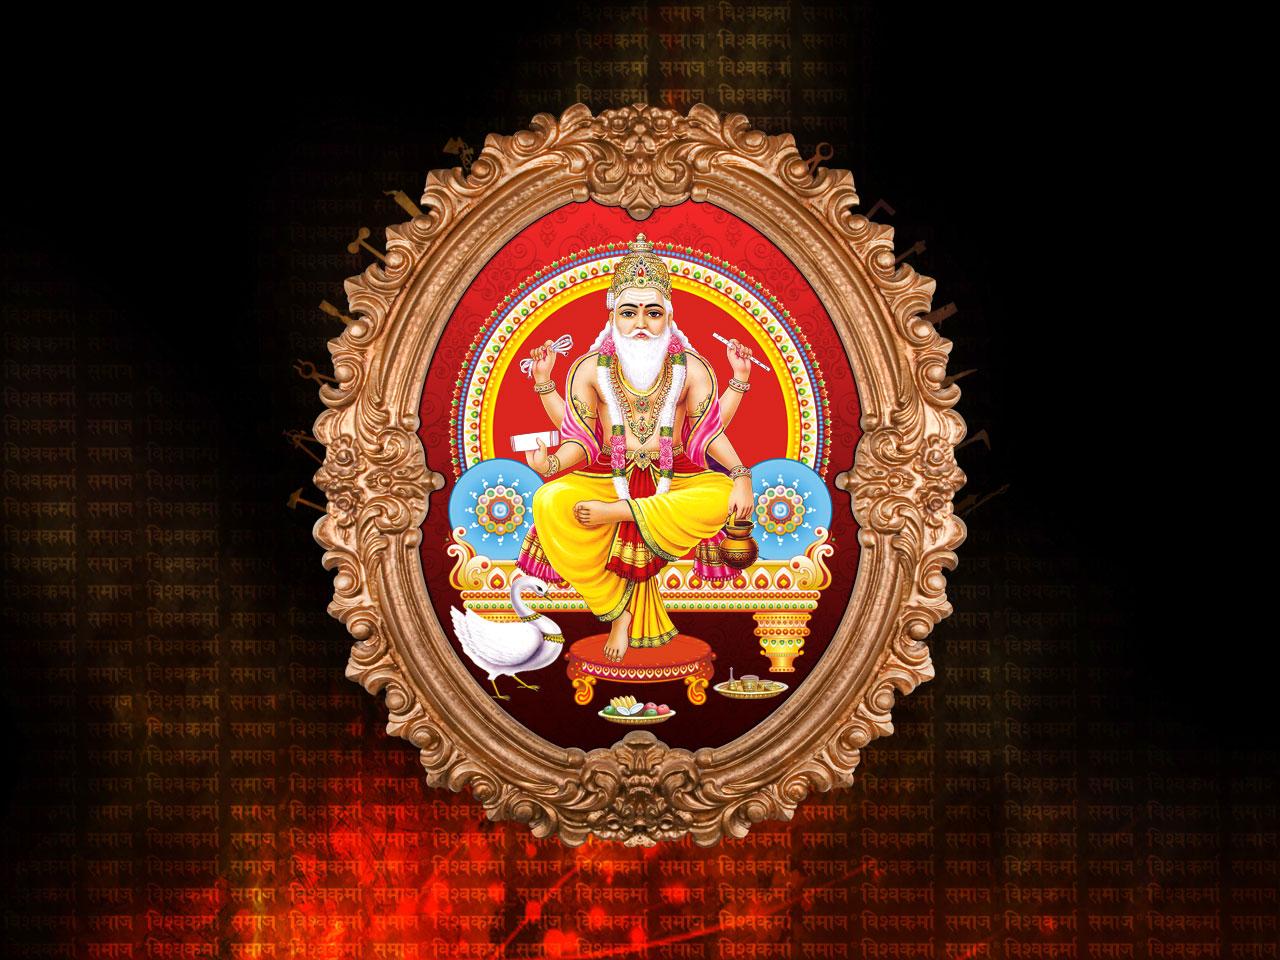 Vishwakarma Hd Wallpaper Free Download